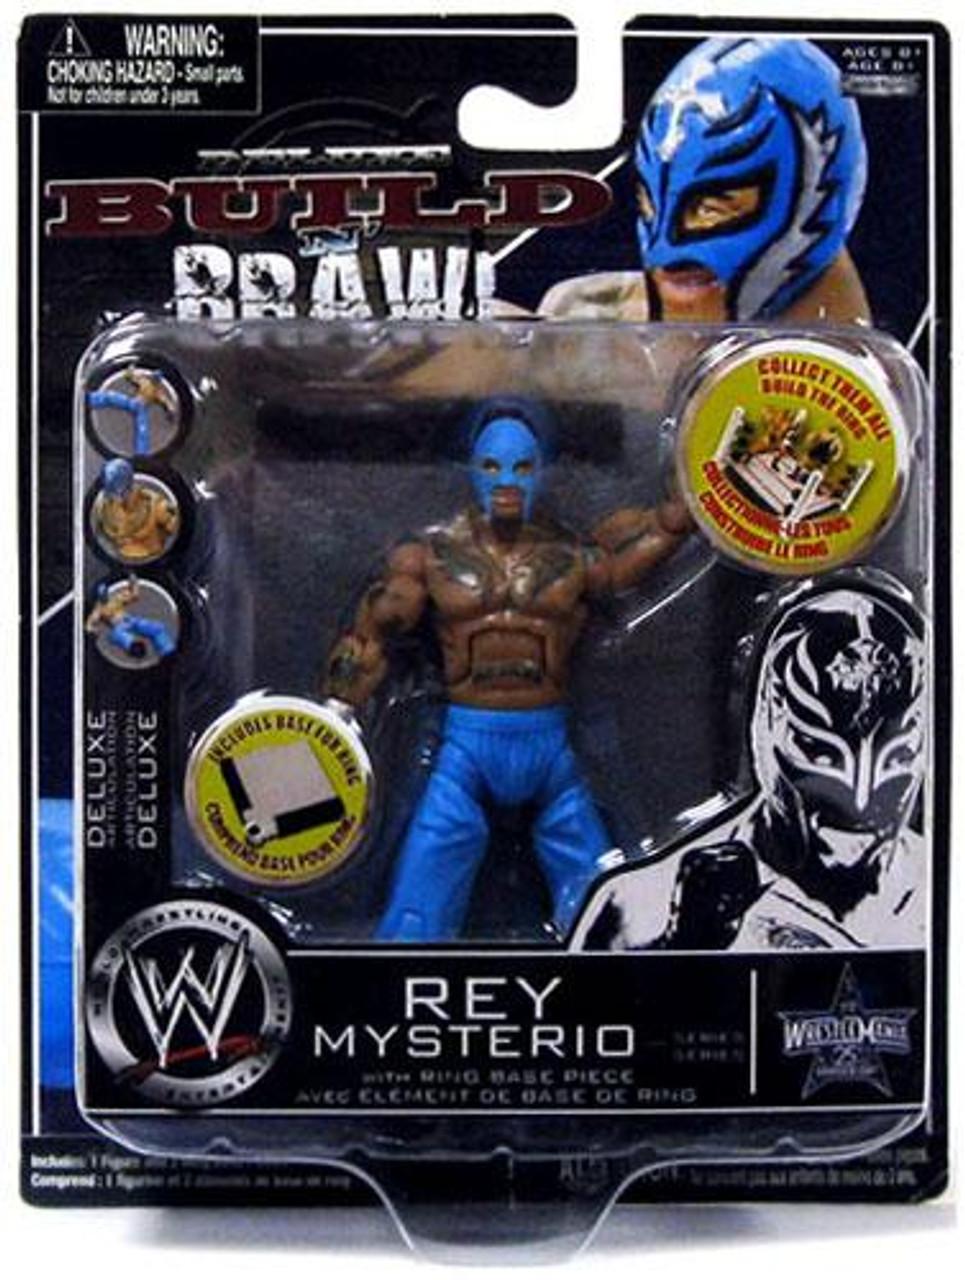 WWE Wrestling Build N' Brawl 25th Anniversary Rey Mysterio Action Figure [Blue Pants]